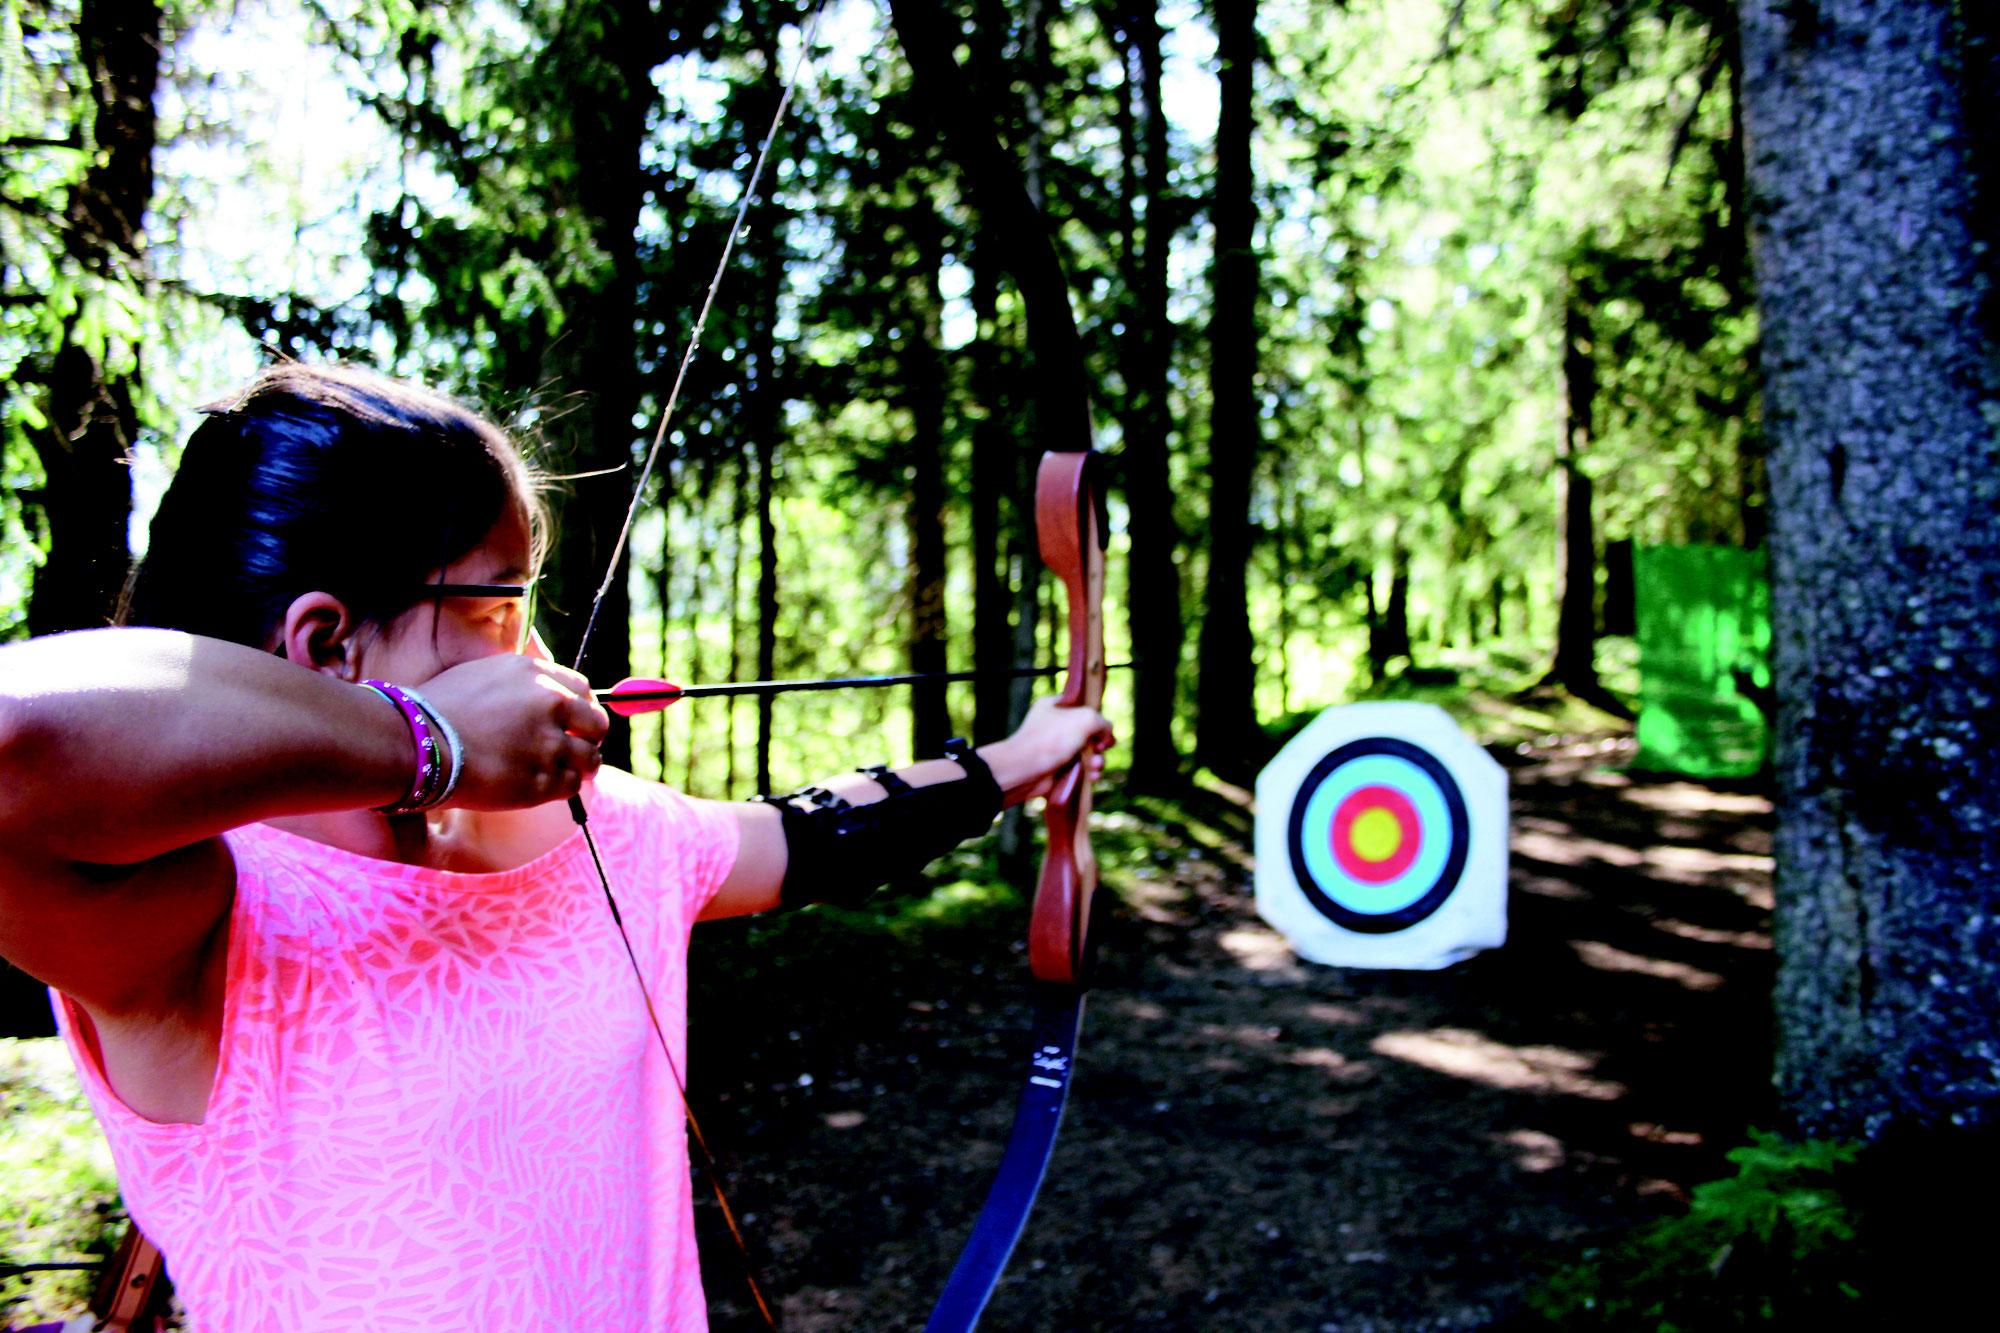 Spiel, Spaß, Lernen fürs Leben und Ferienstimmung - Divertimento, Imparare per la vita ed un estate spensierata